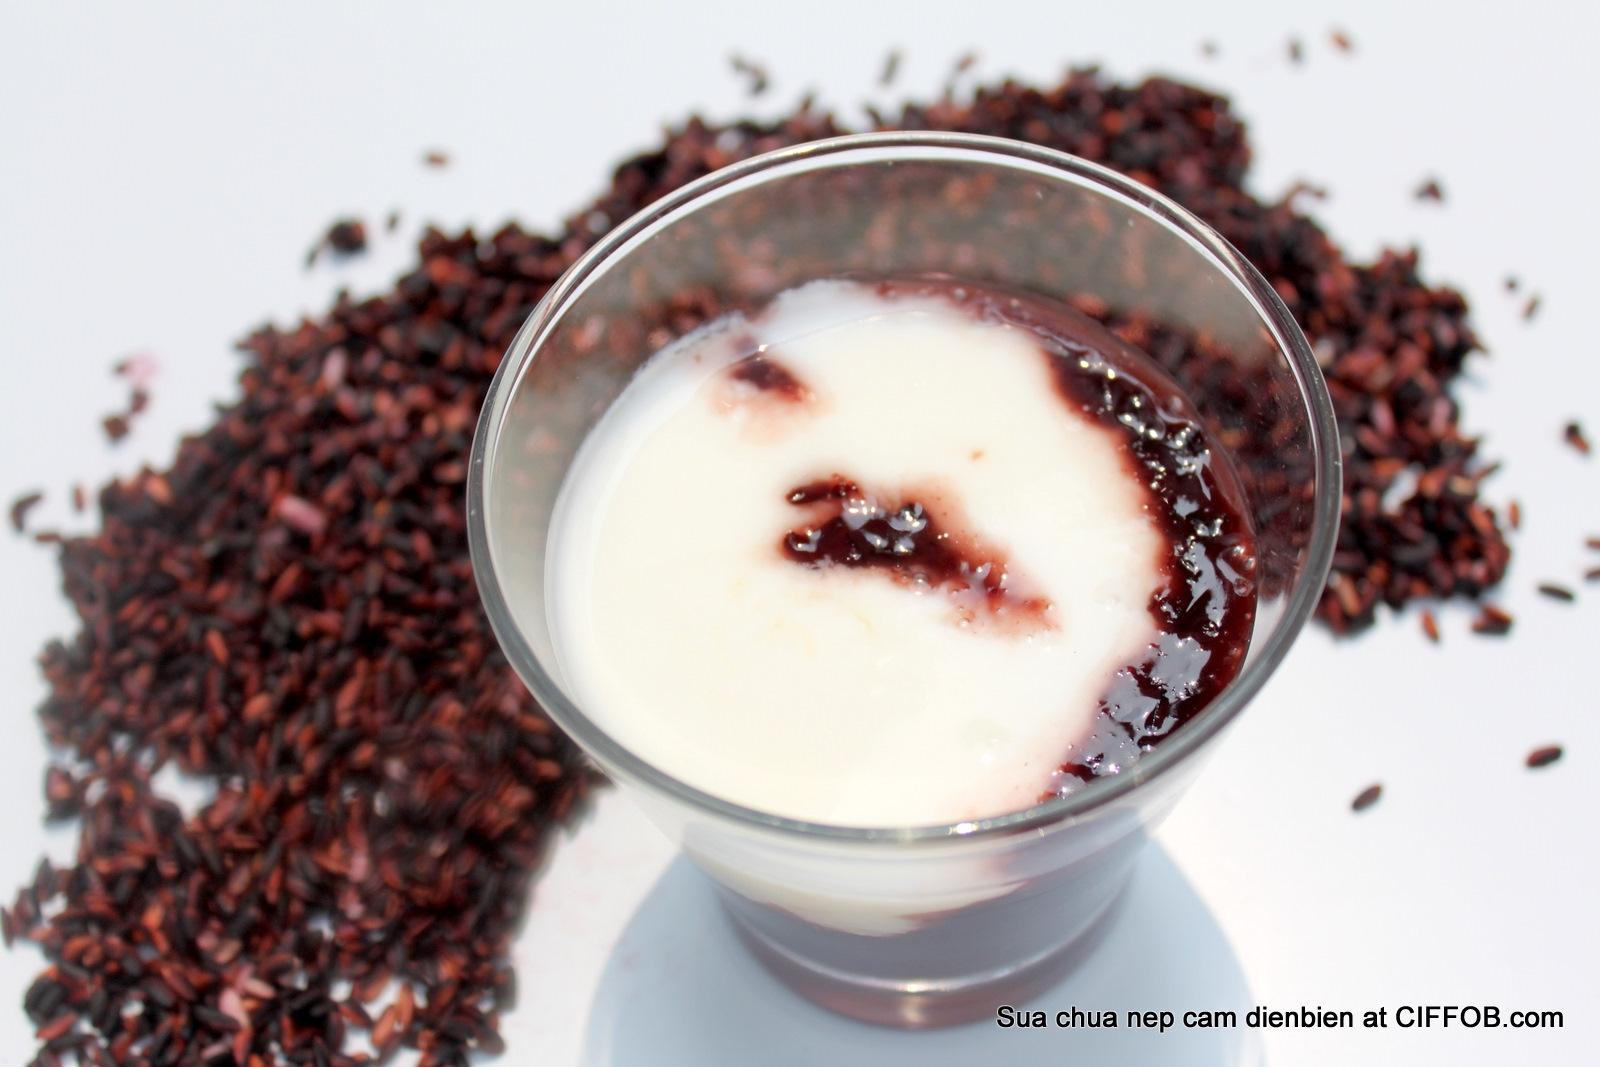 5 quan niệm sai lầm về sữa chua